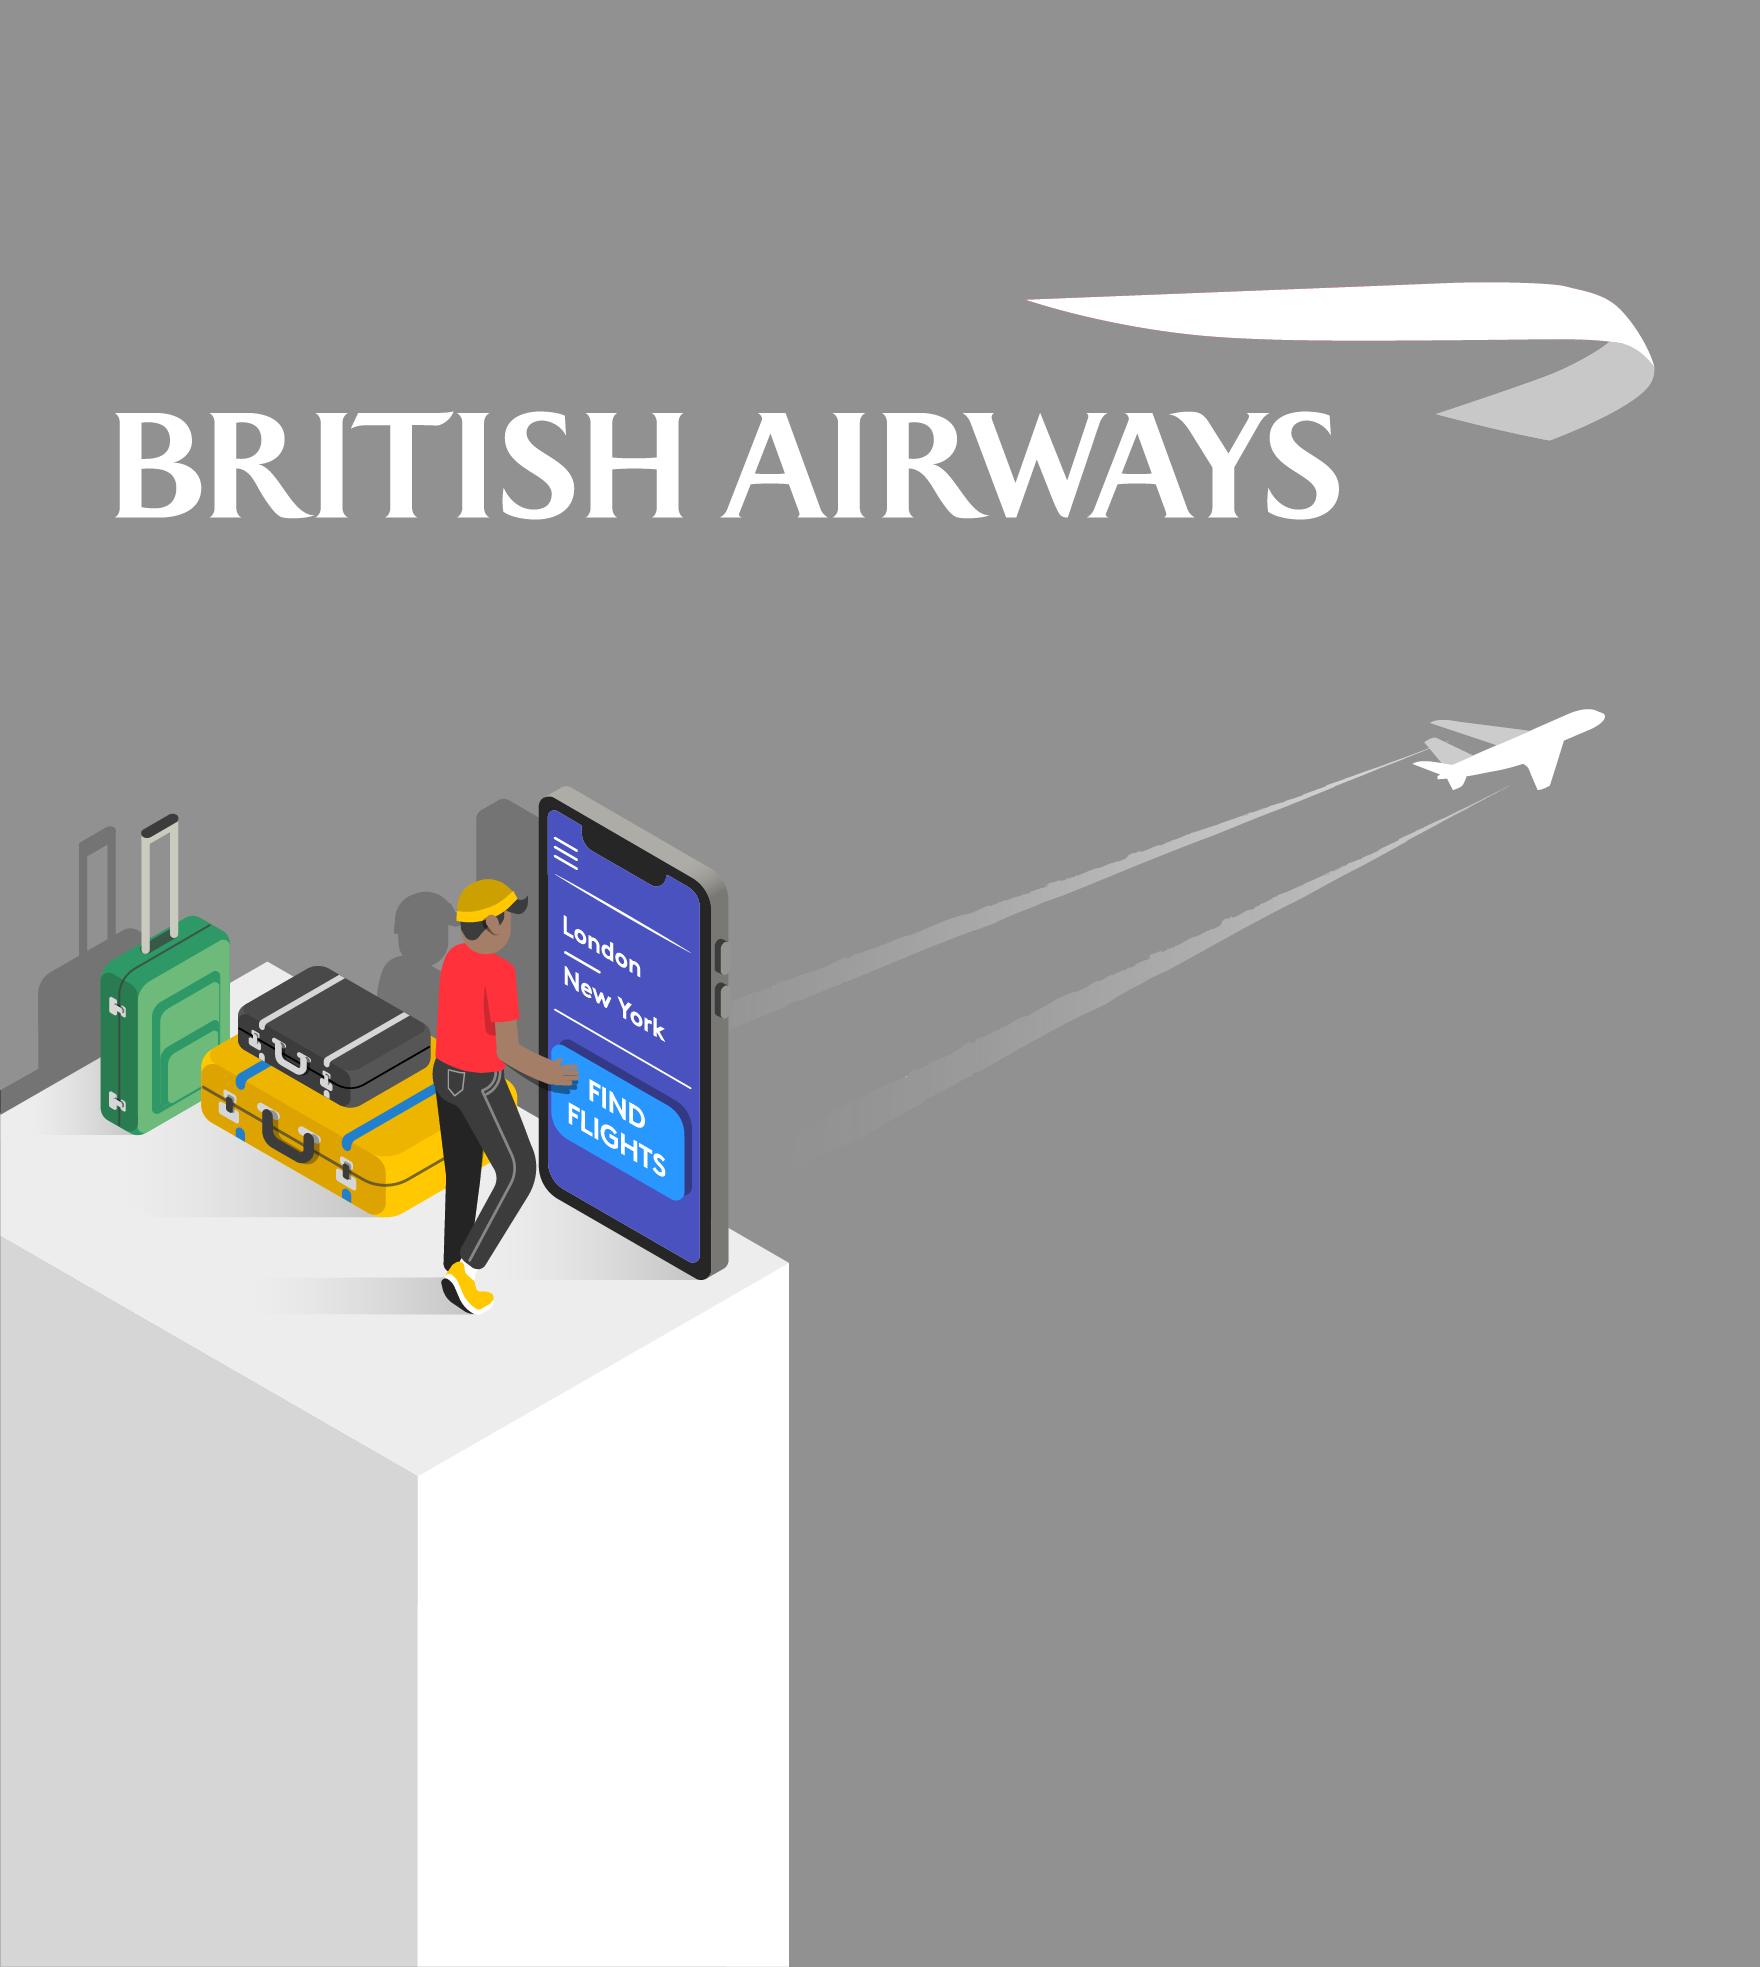 British Airways illustration